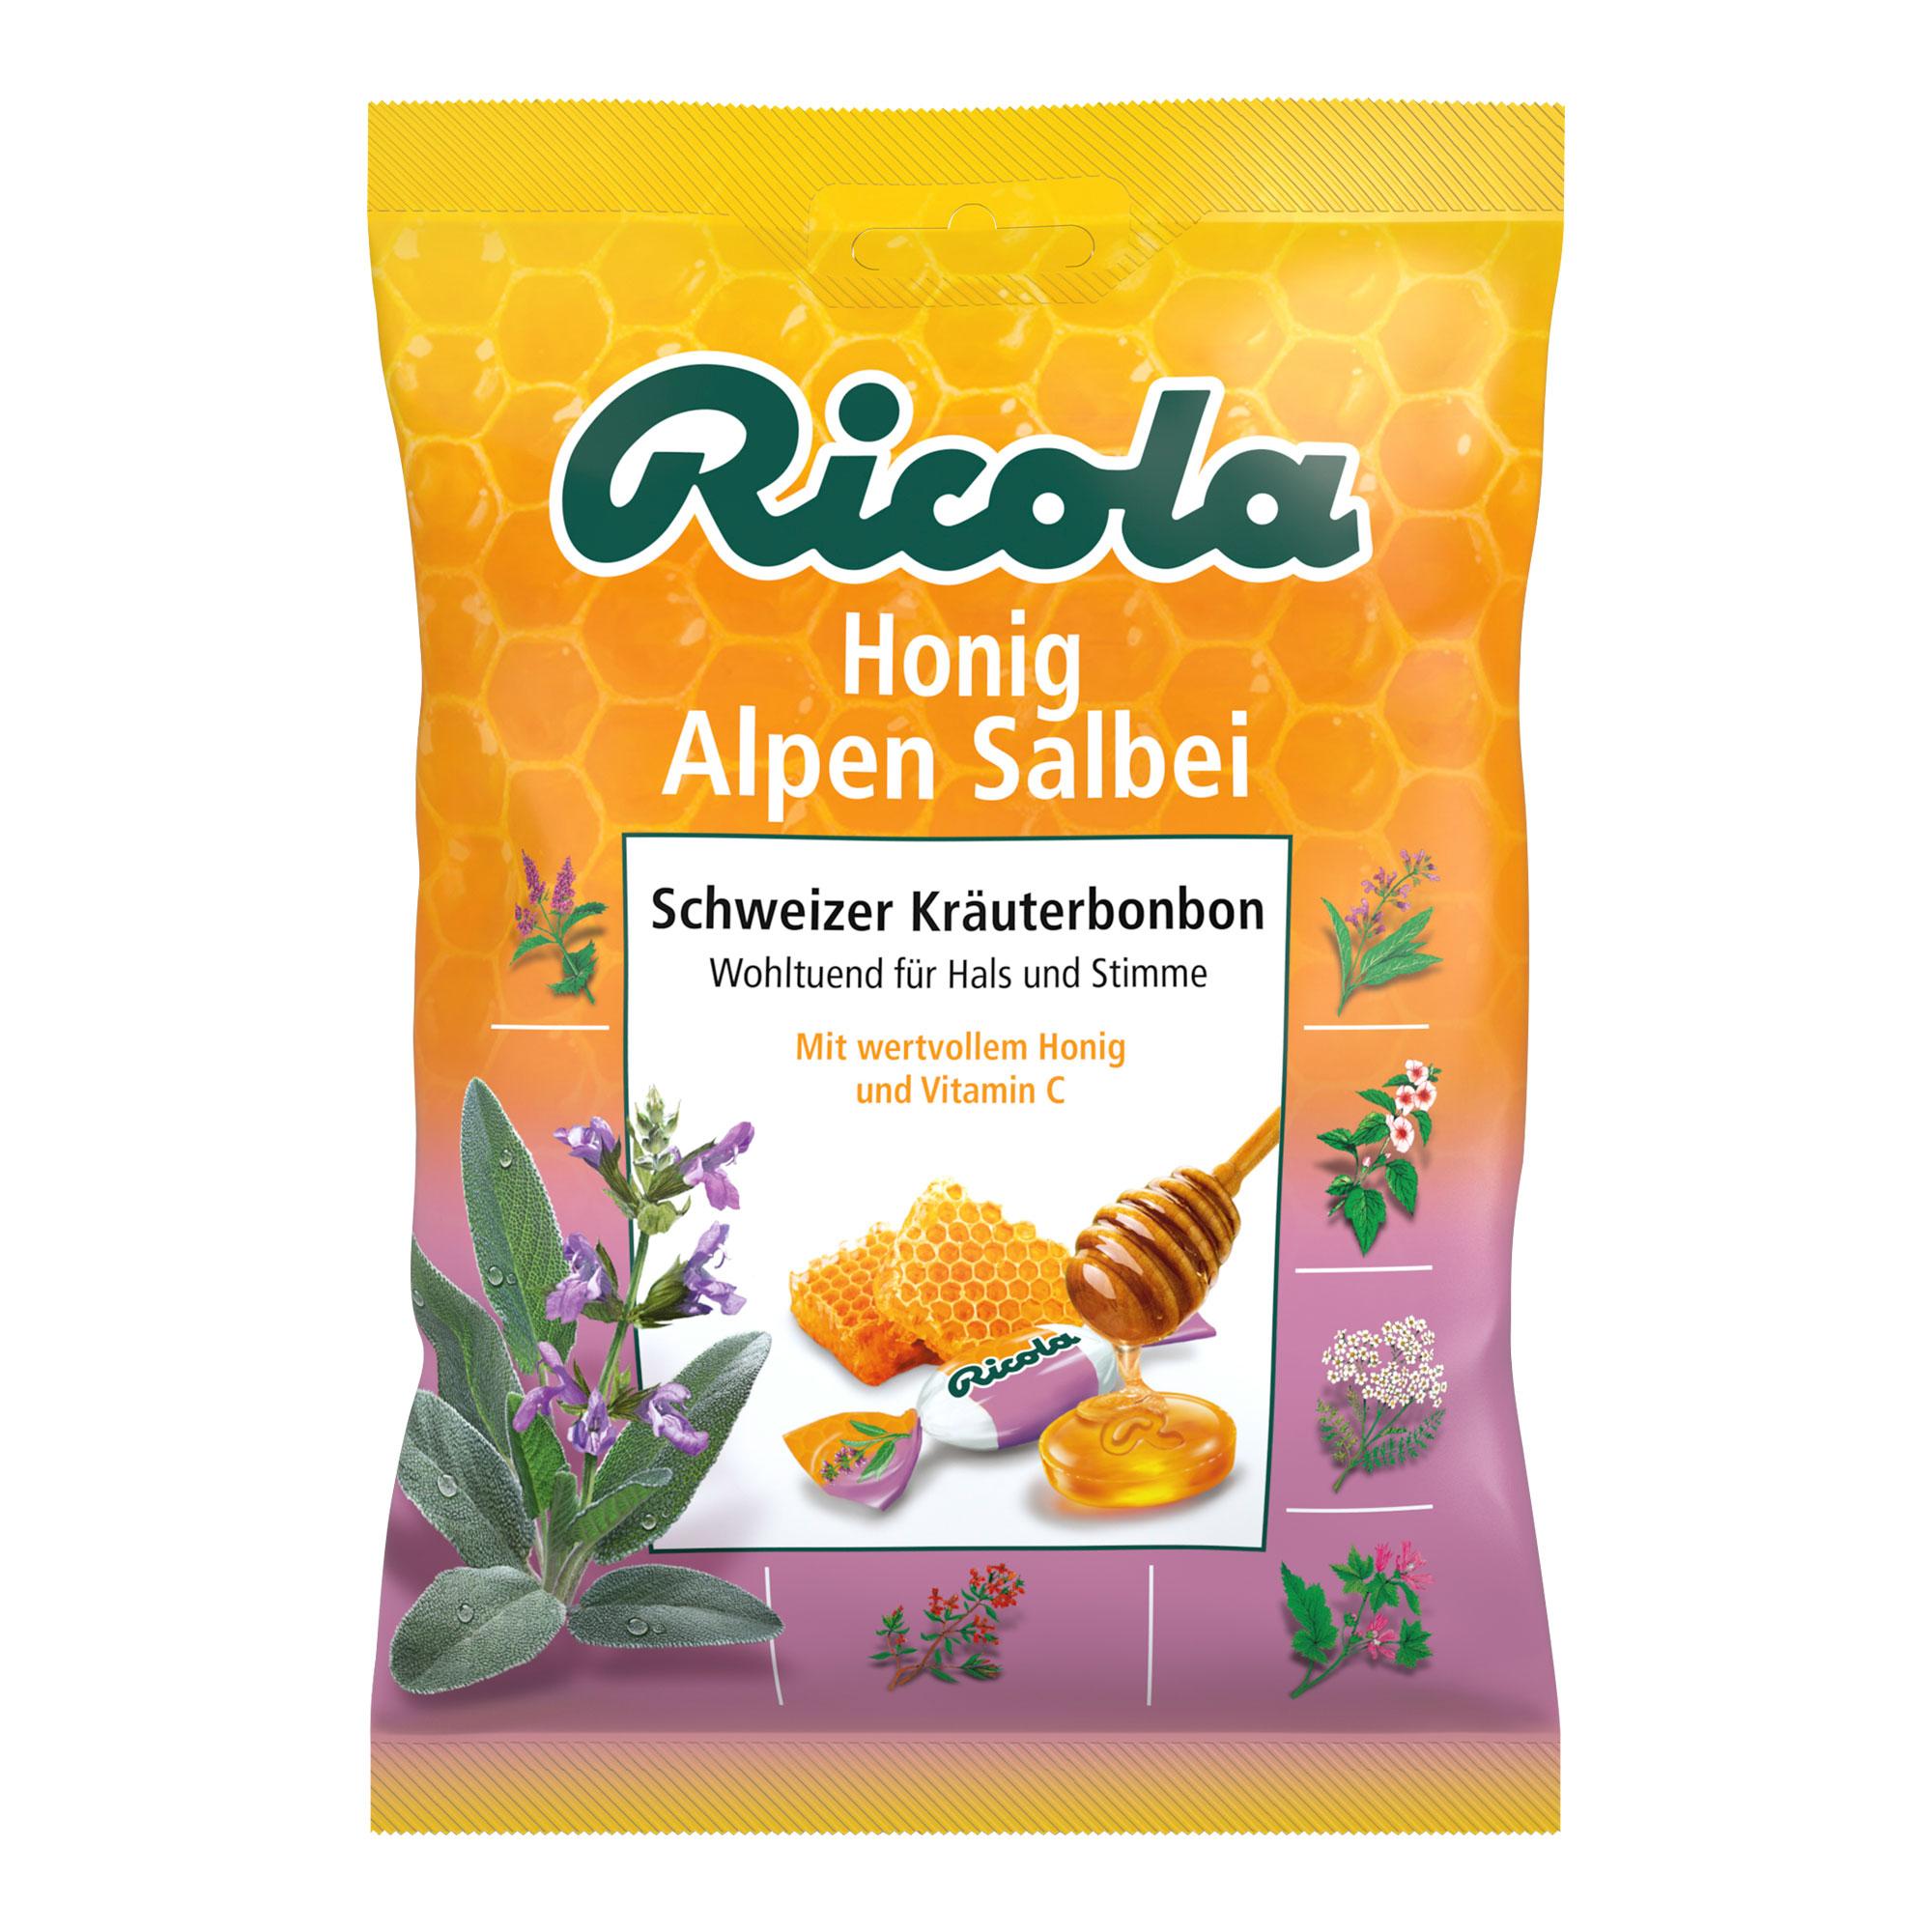 Ricola Honig Alpen Salbei Bonbons